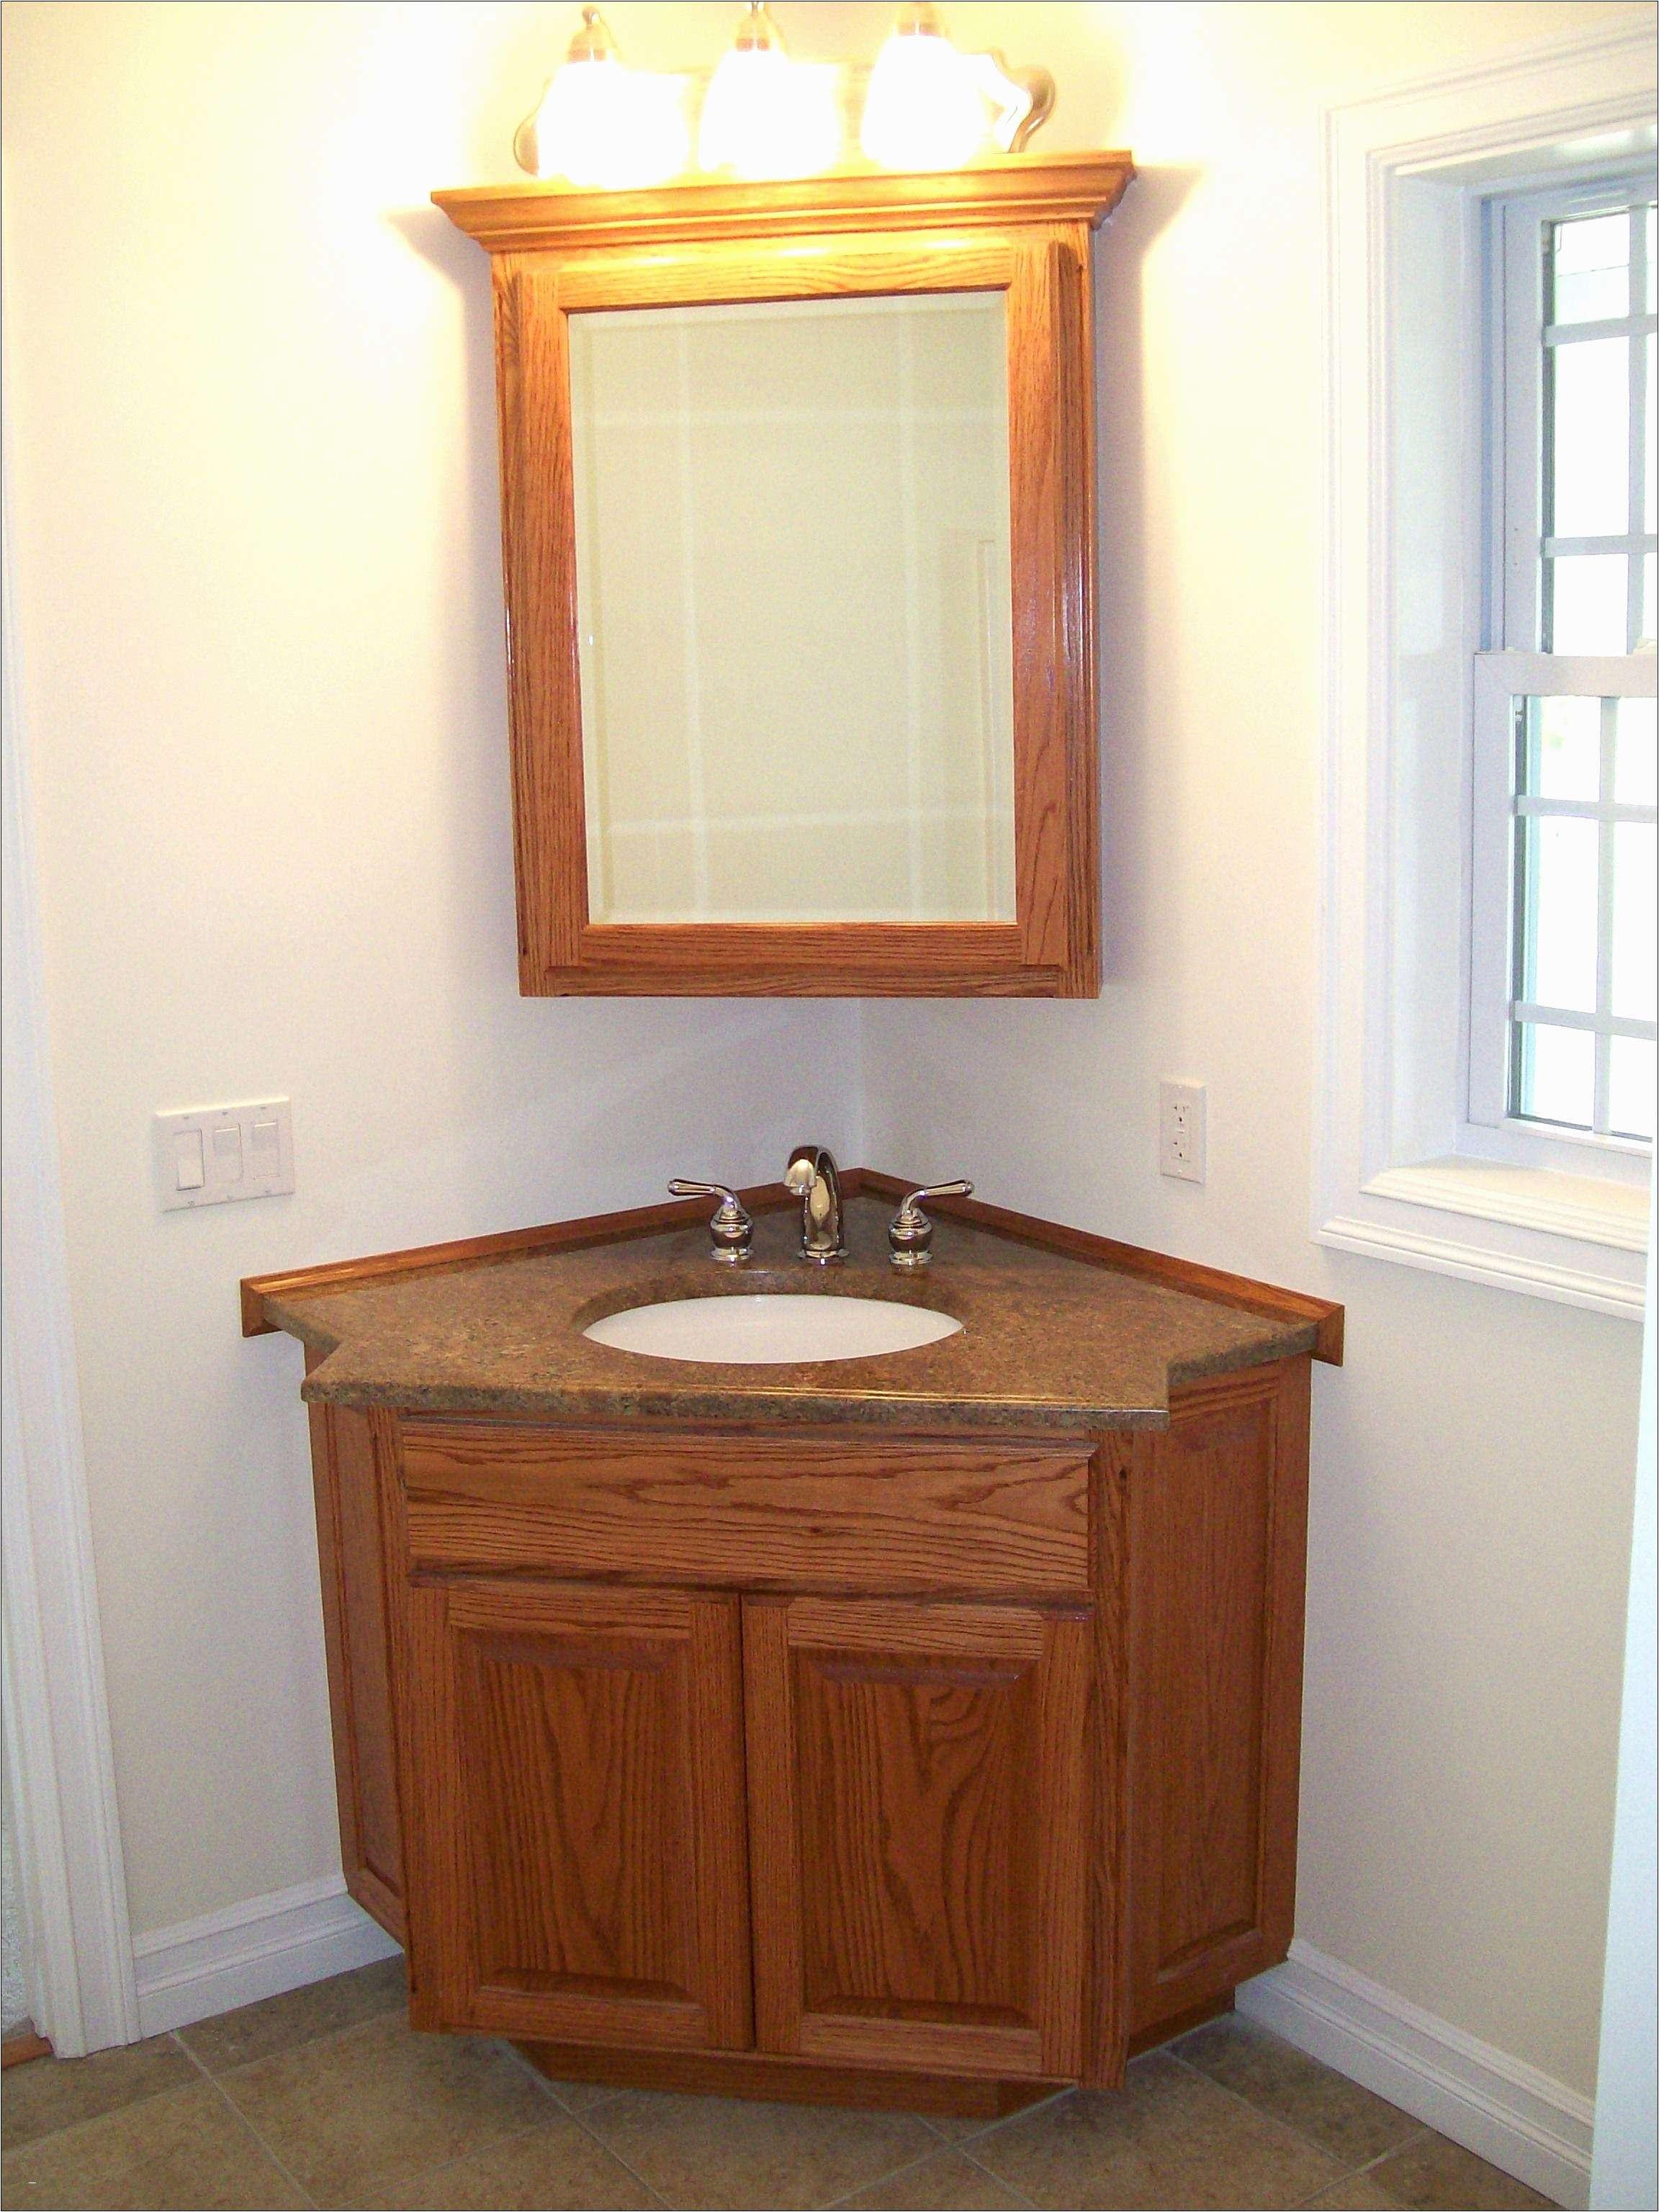 astonishing walmart bathroom vanities with sink and 12 inch bathroom sink luxury mercial bathroom sinks new sink mercial